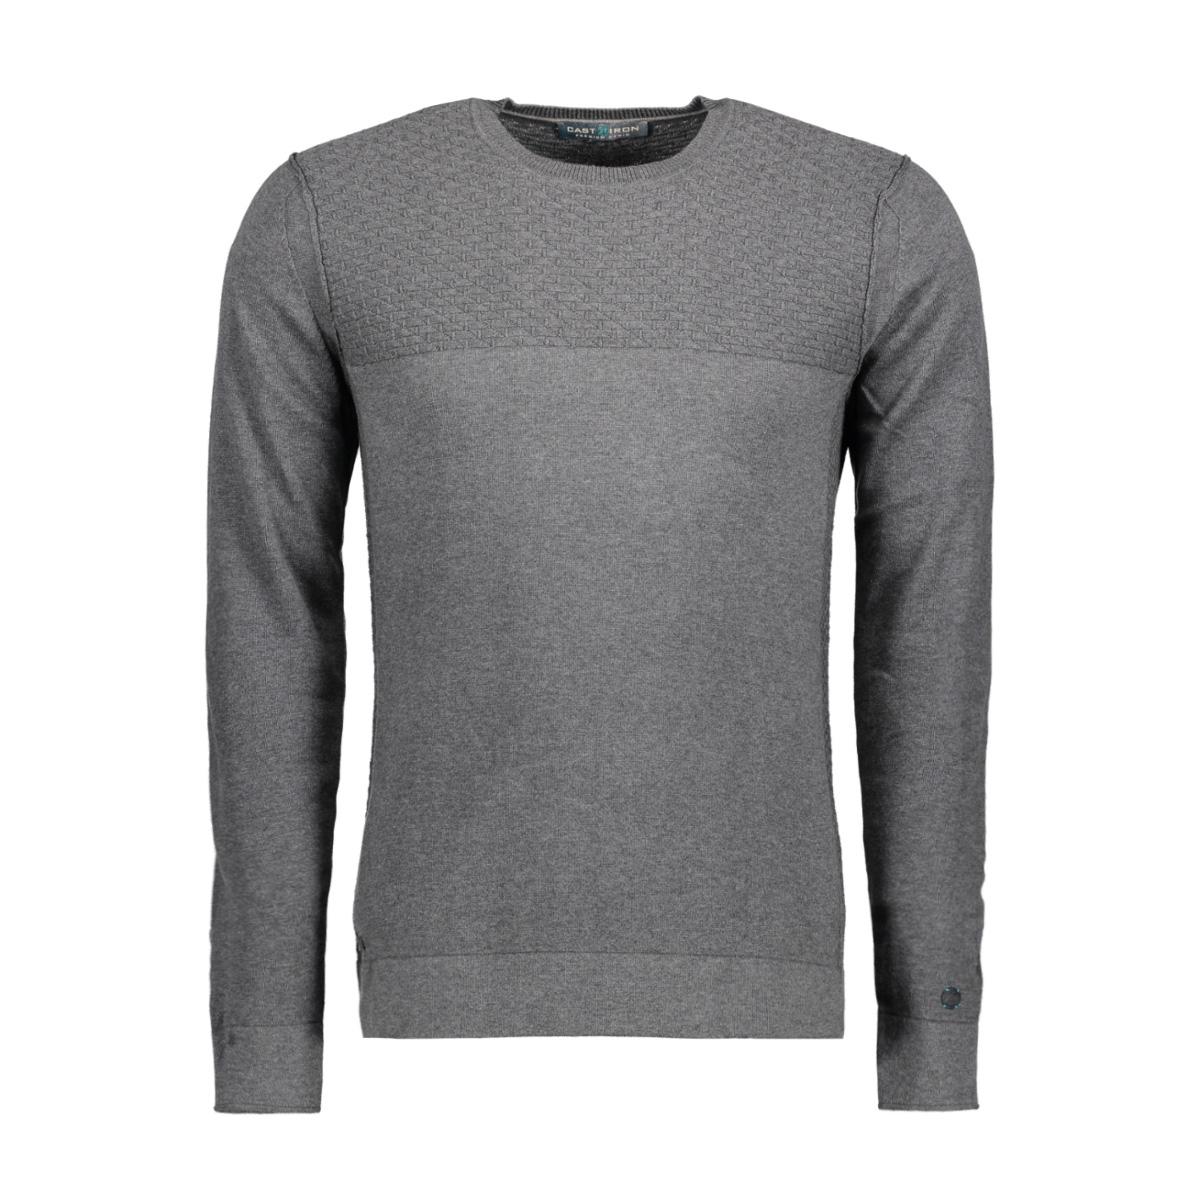 ckw175400 cast iron sweater 996